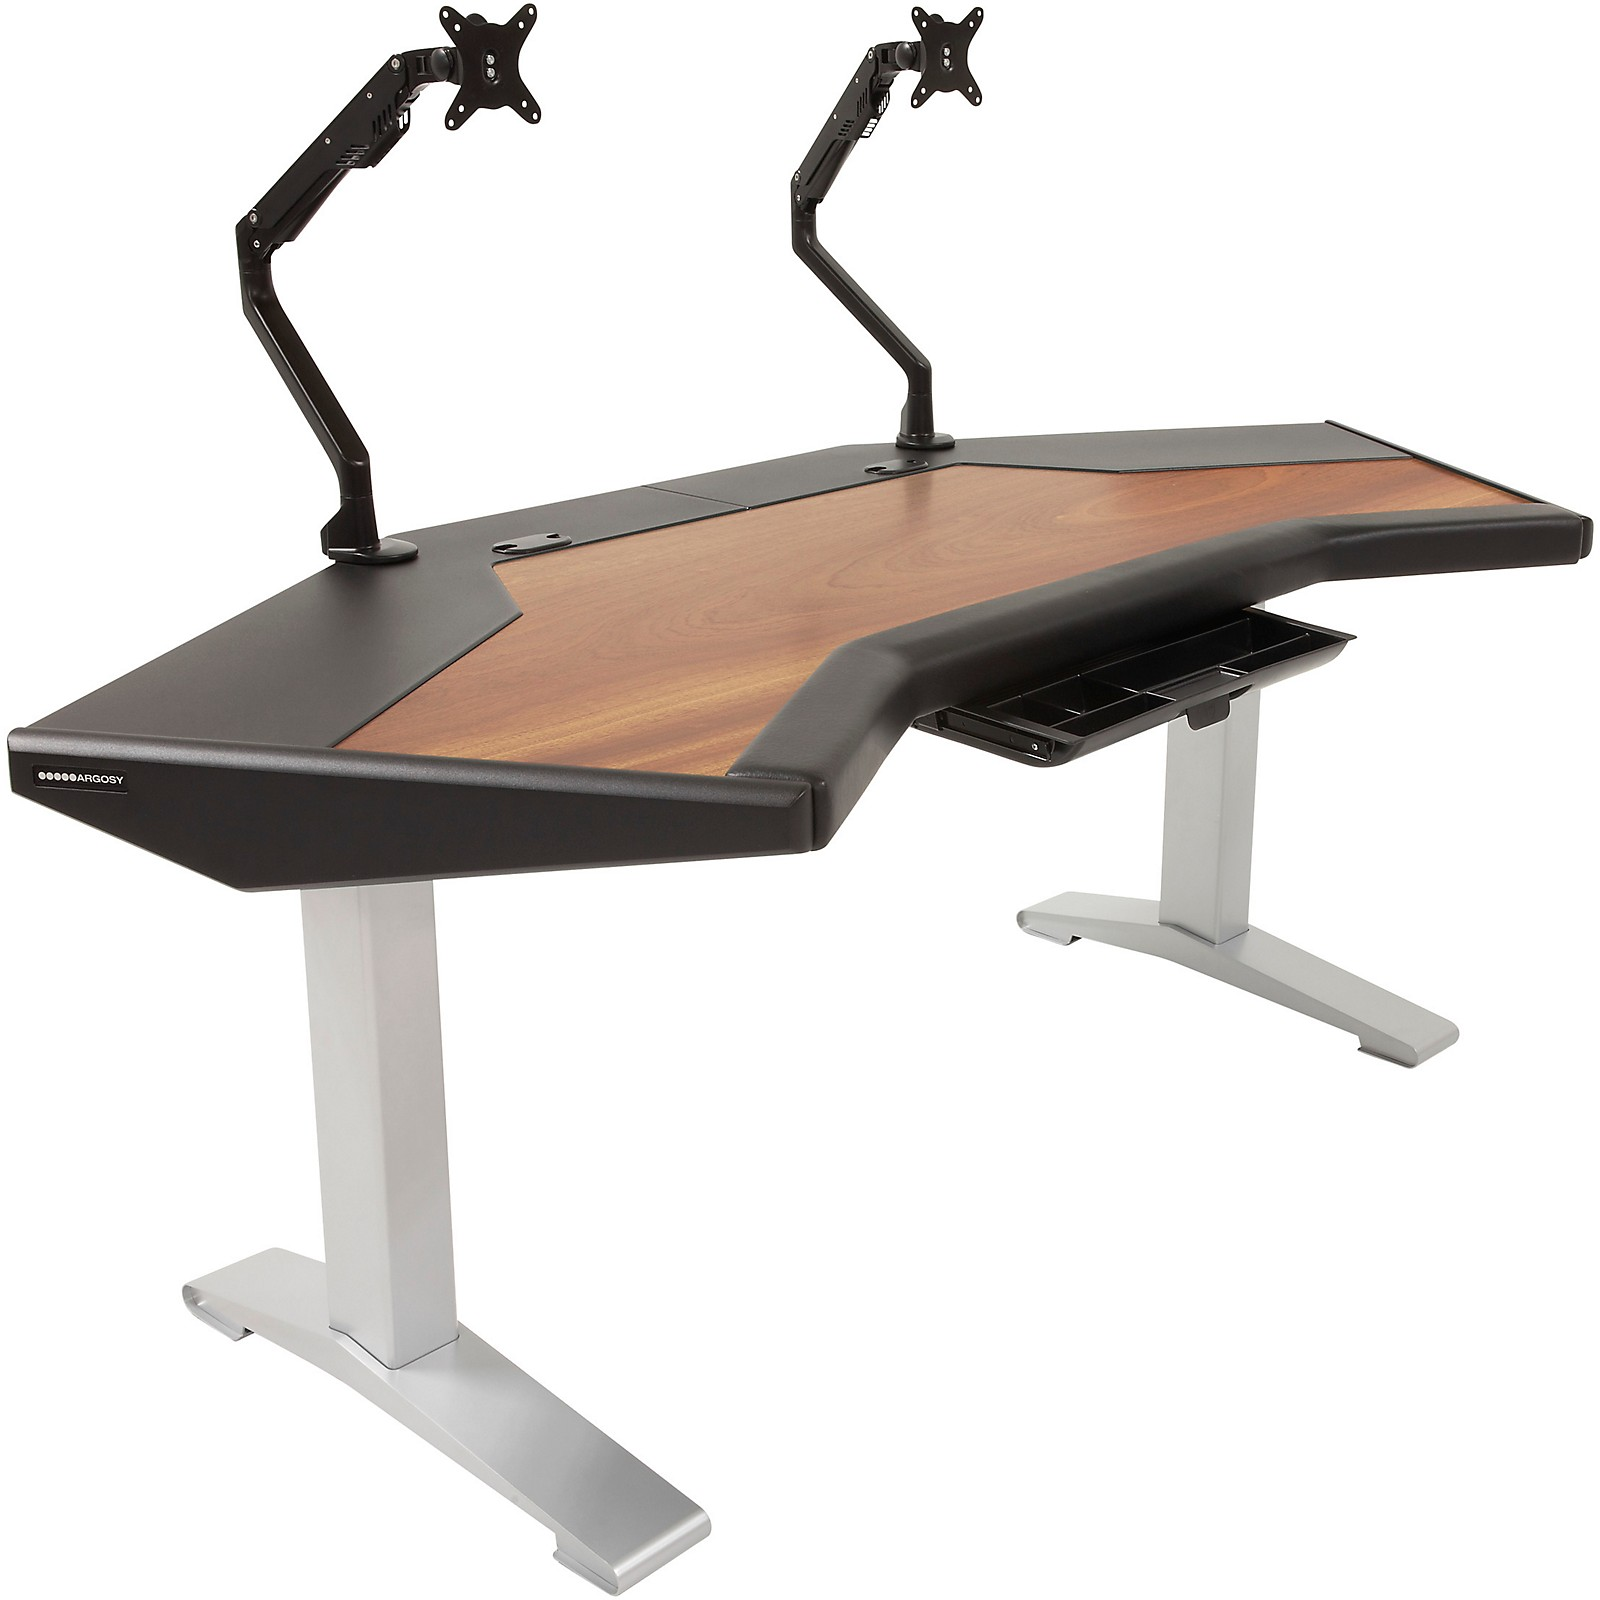 Argosy Halo G Plus Desk with Mahogany Surface